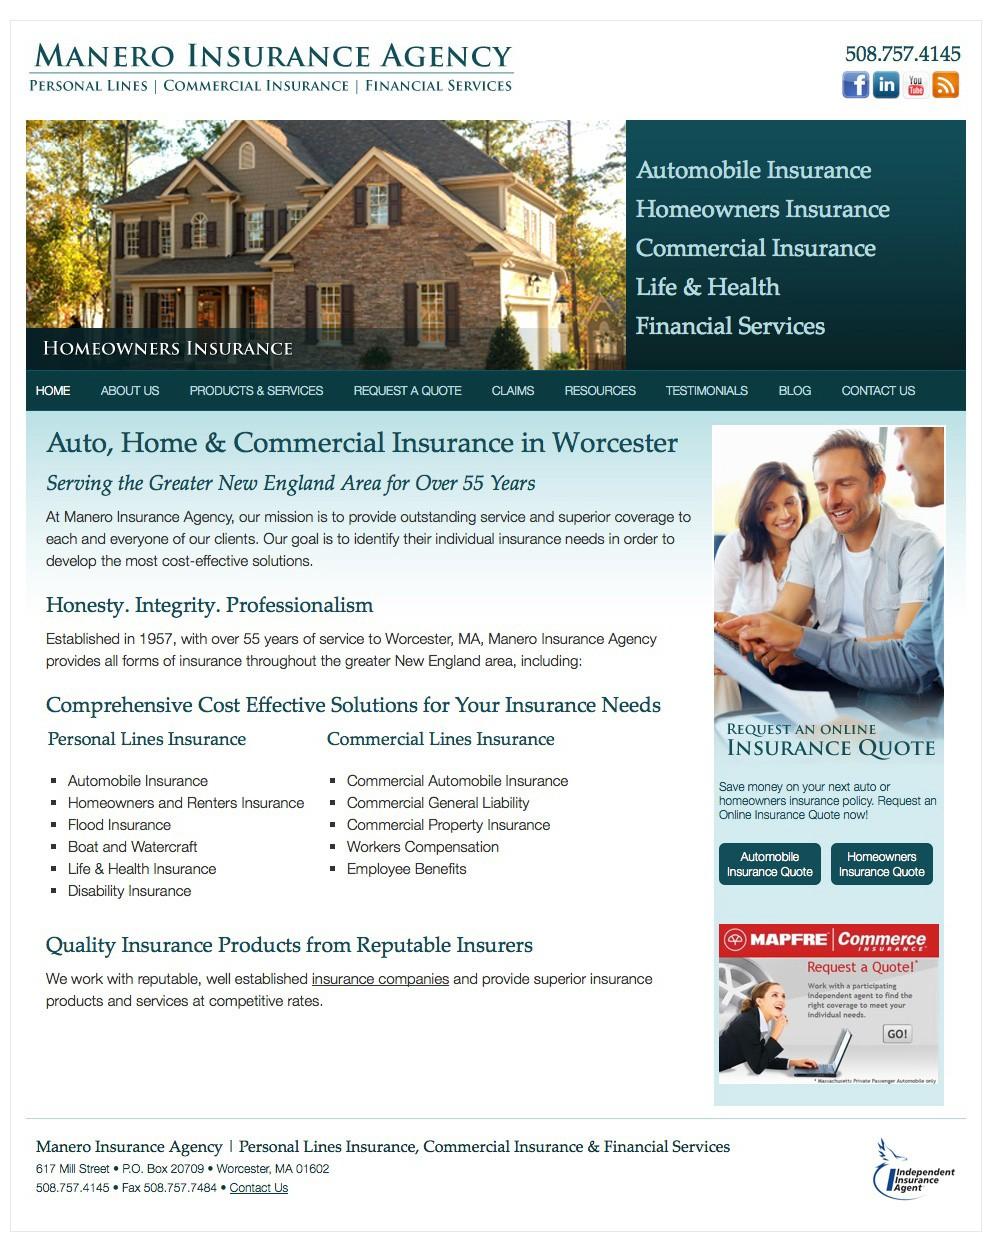 Manero-Insurance-Agency